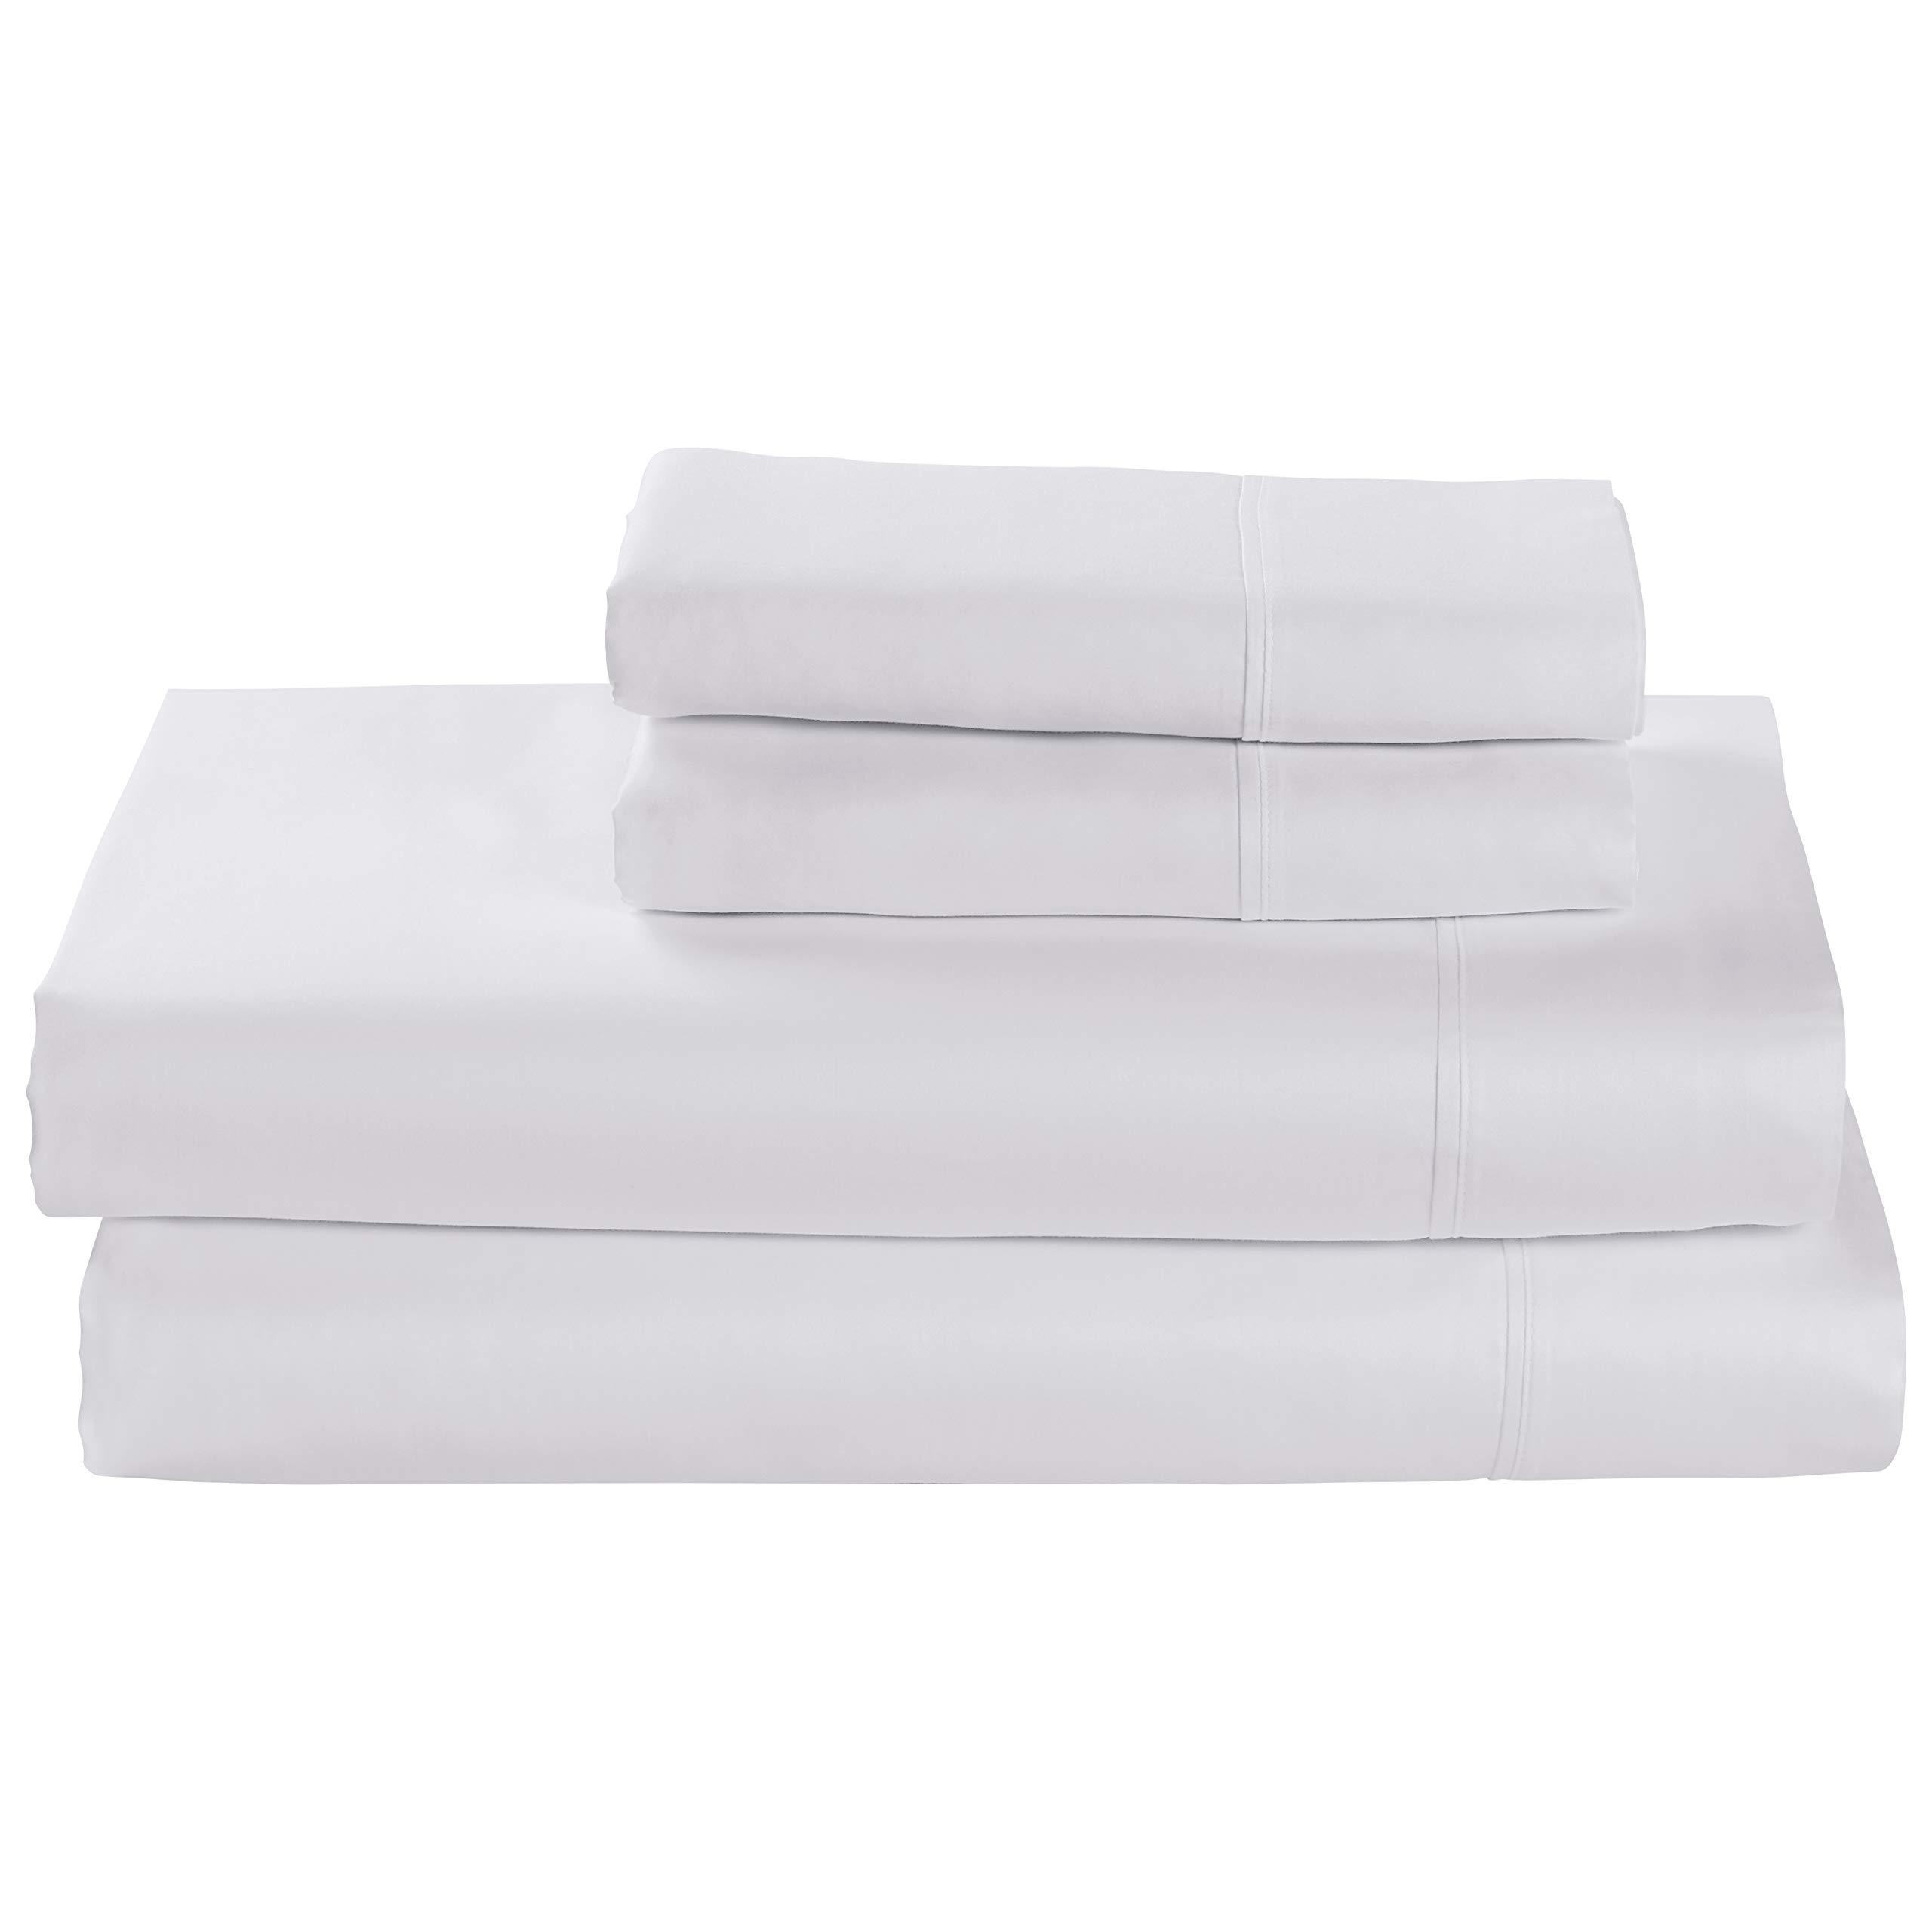 Rivet Cotton Tencel Bed Sheet Set, Soft and